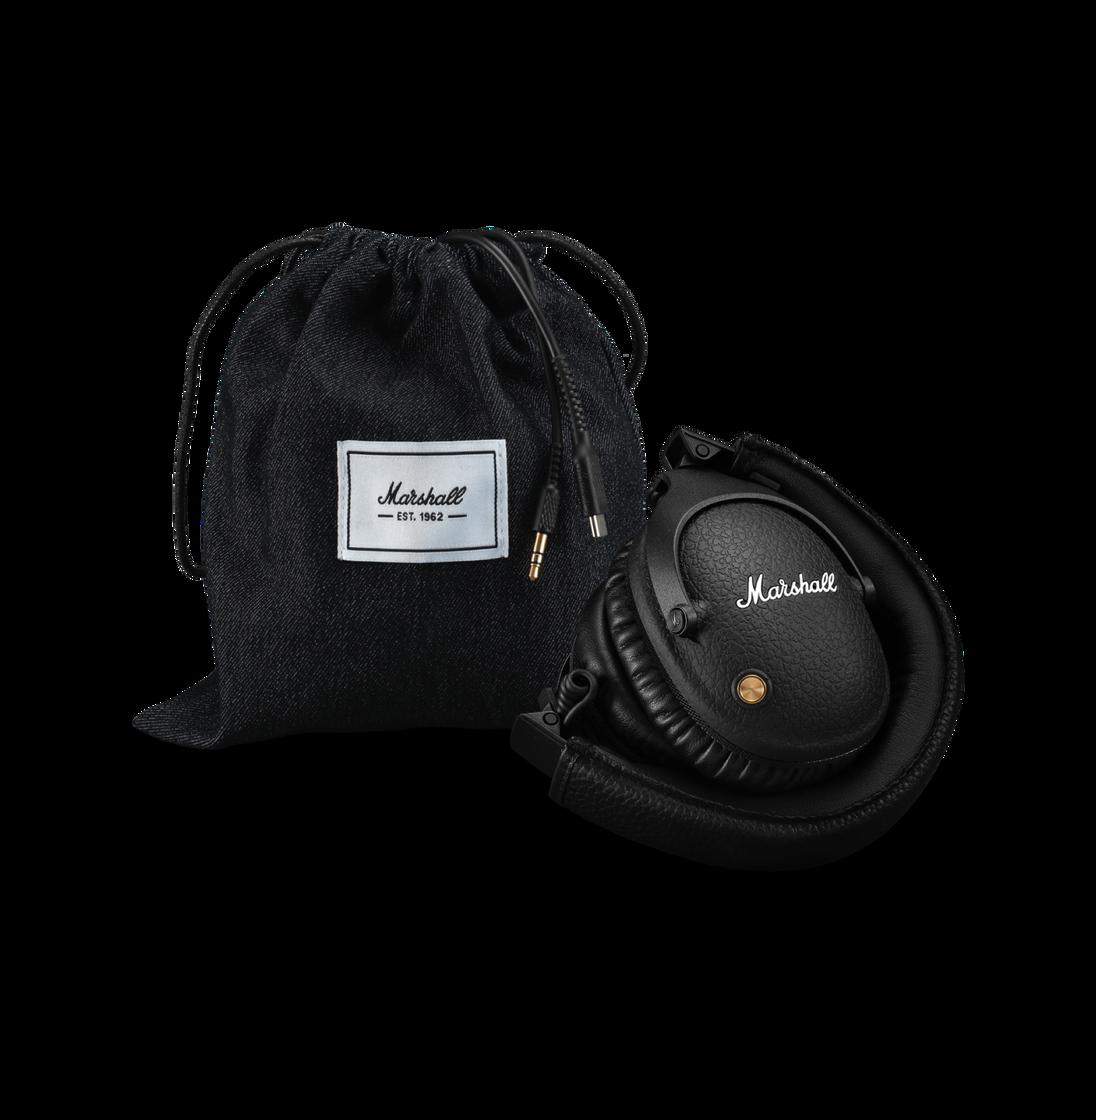 Marshall Monitor II headphones